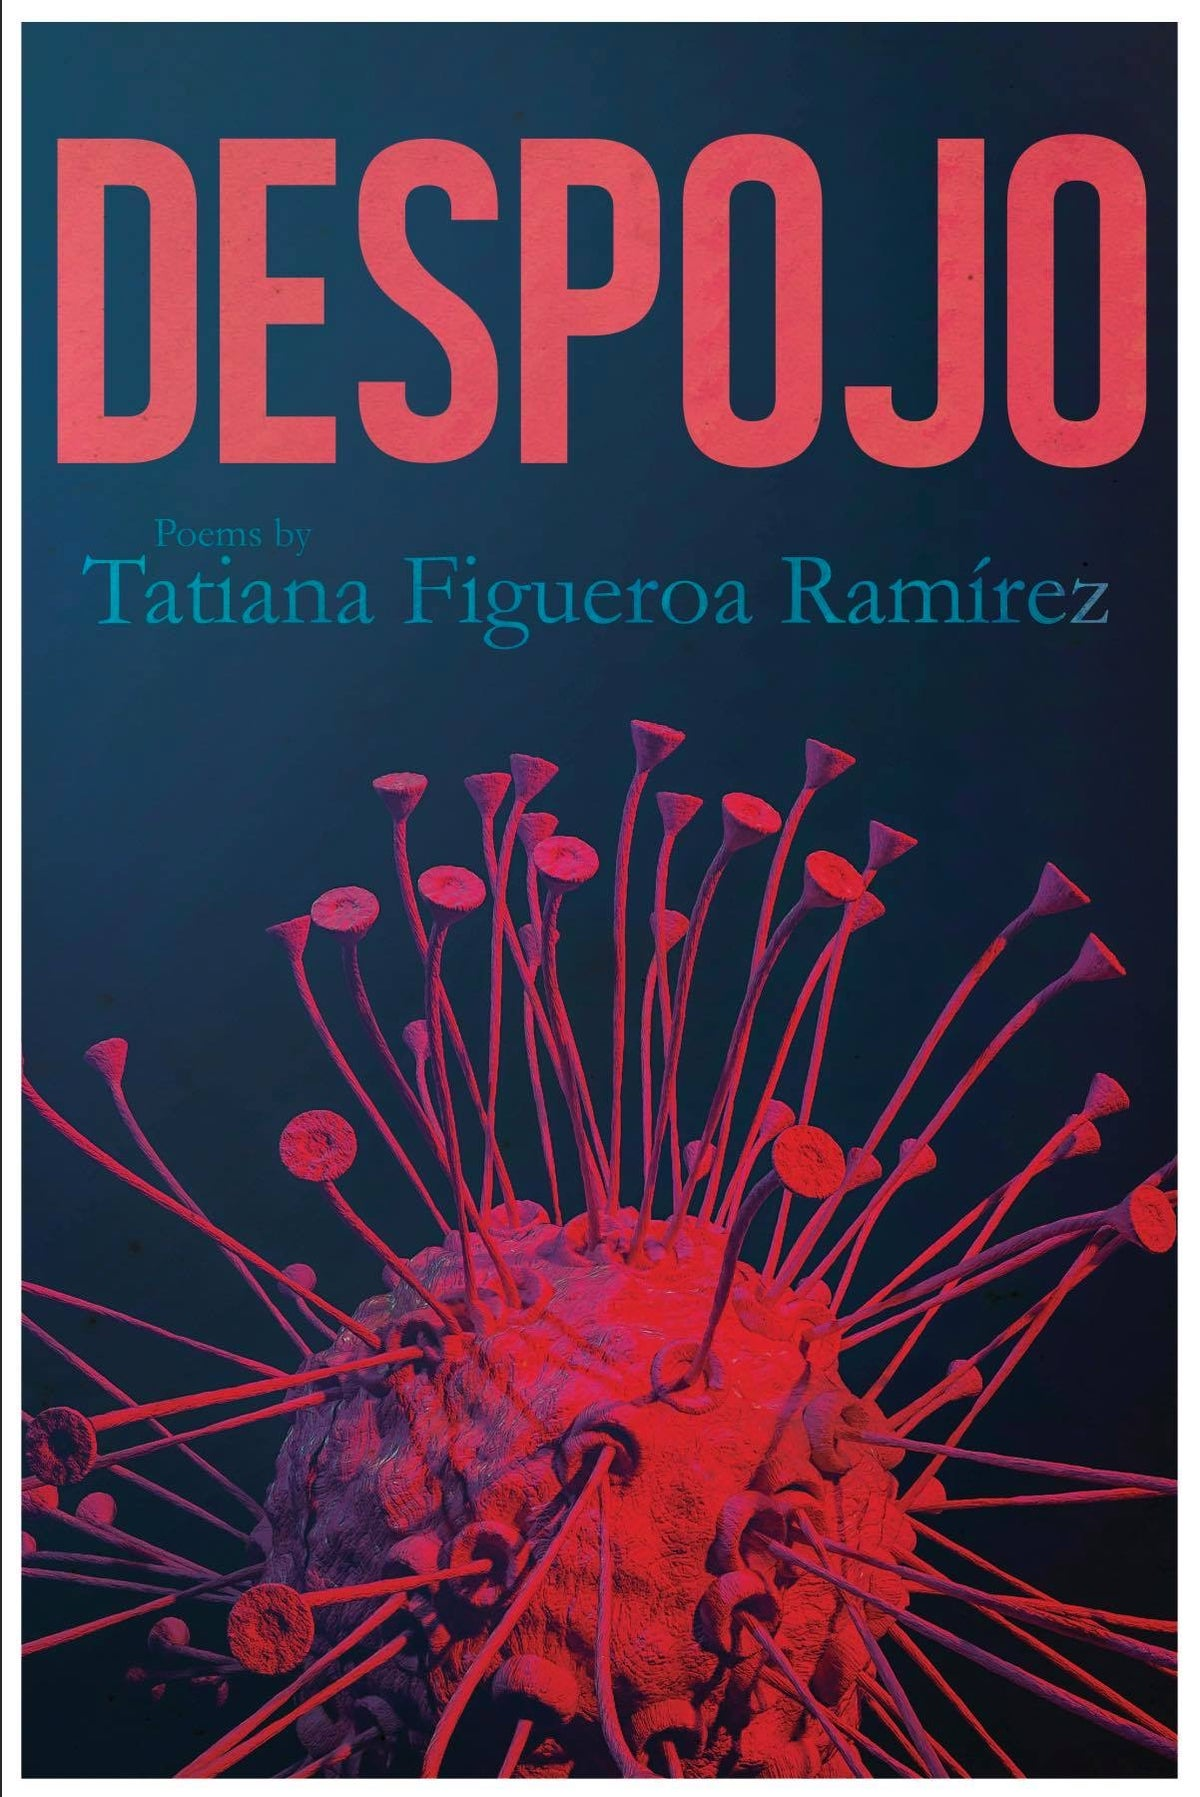 Image of Despojo